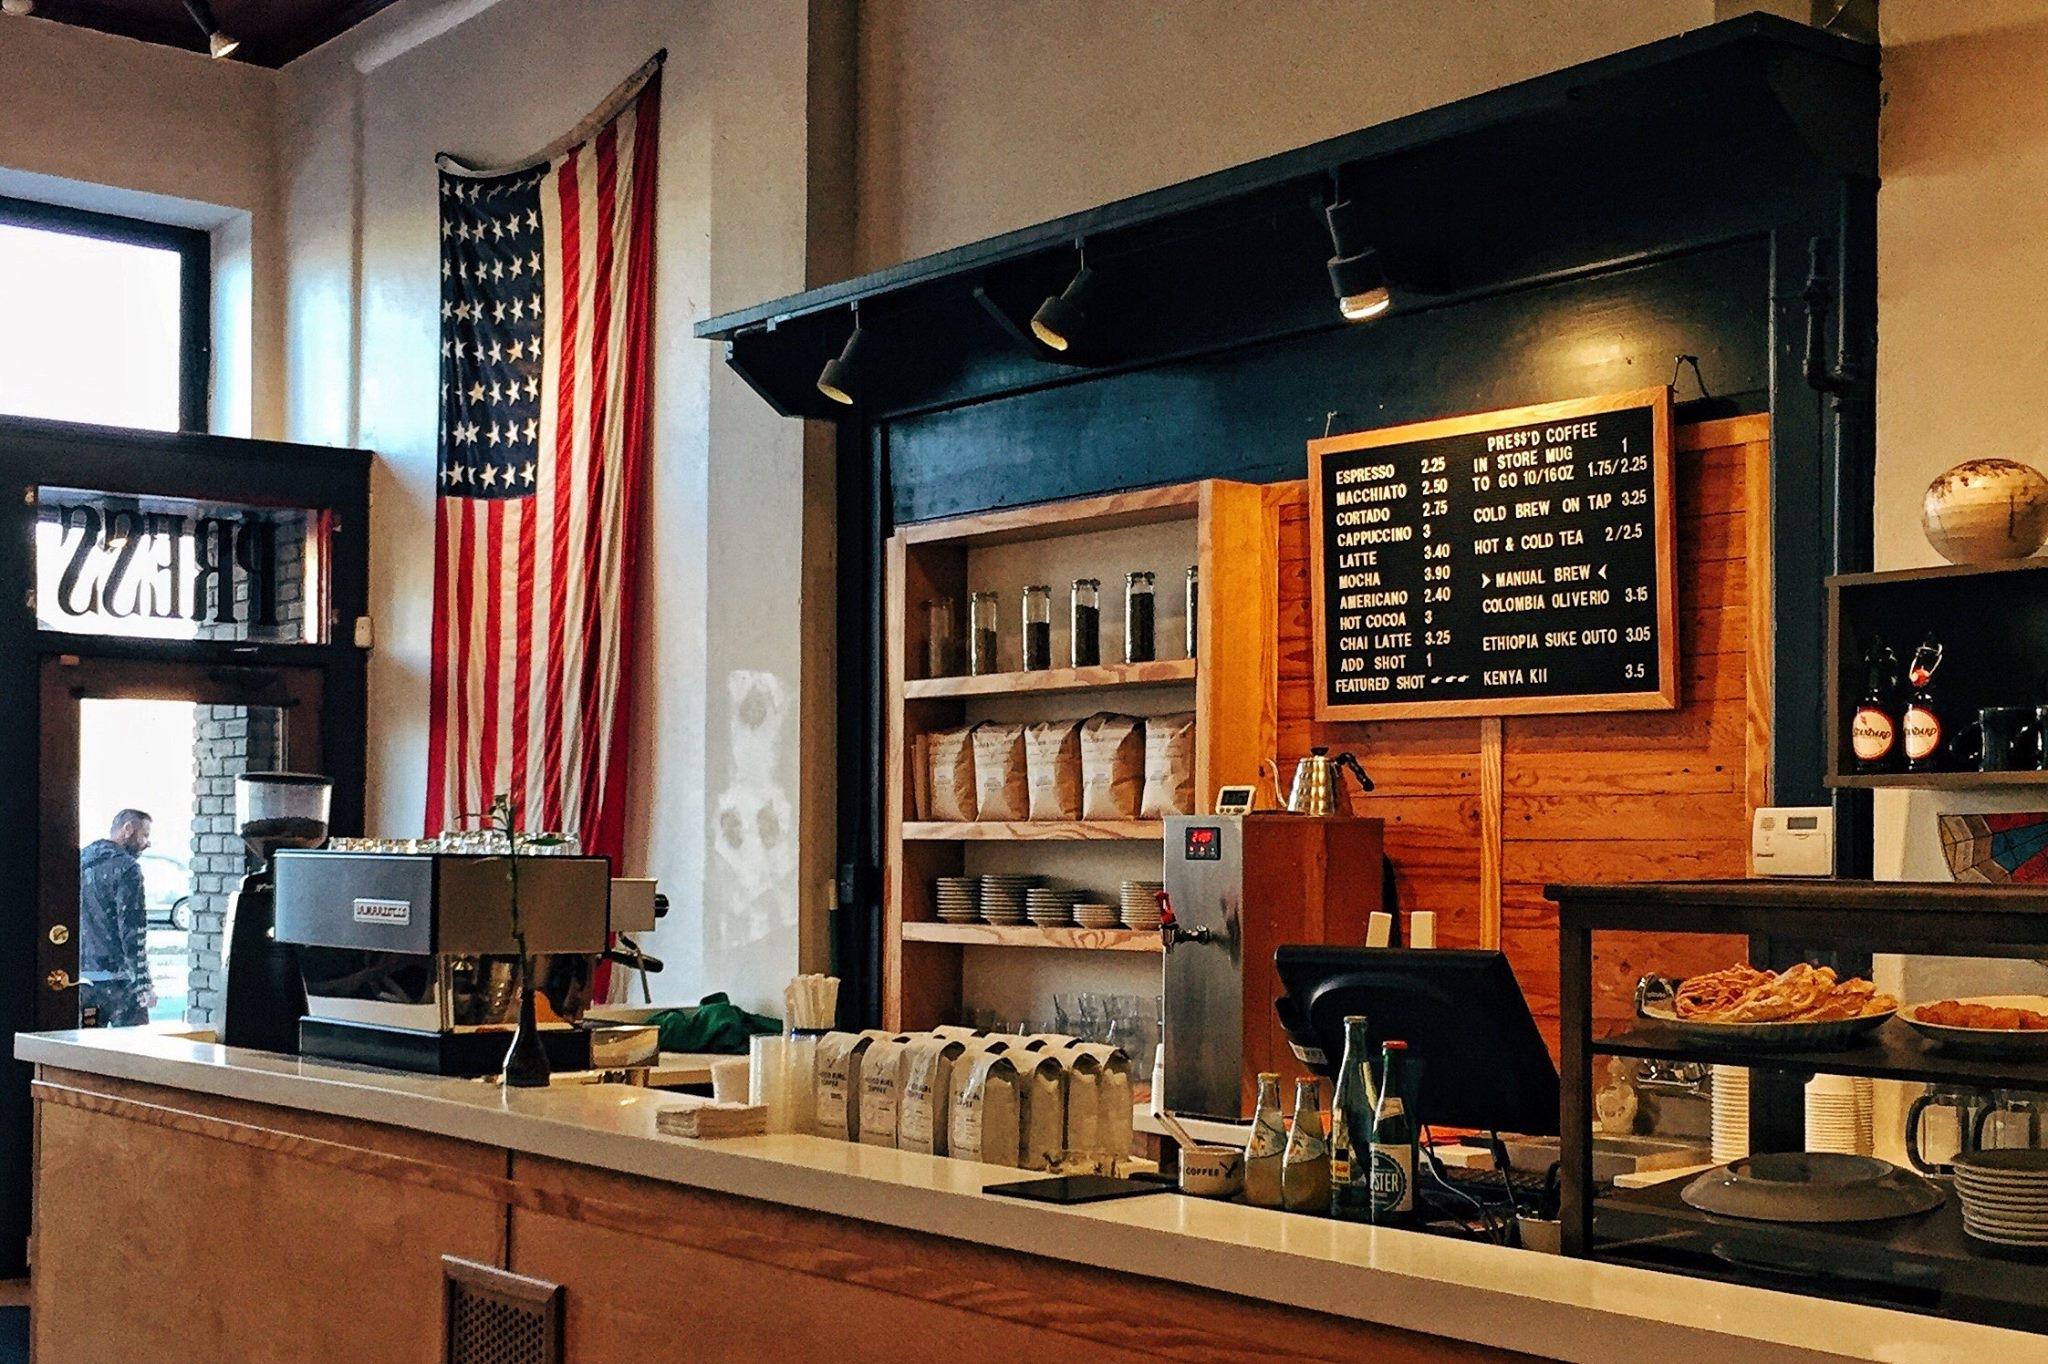 Cafe Coffee Restaurant Home Bar Counter Shop Flag Living Room Interior Design Cabinetry